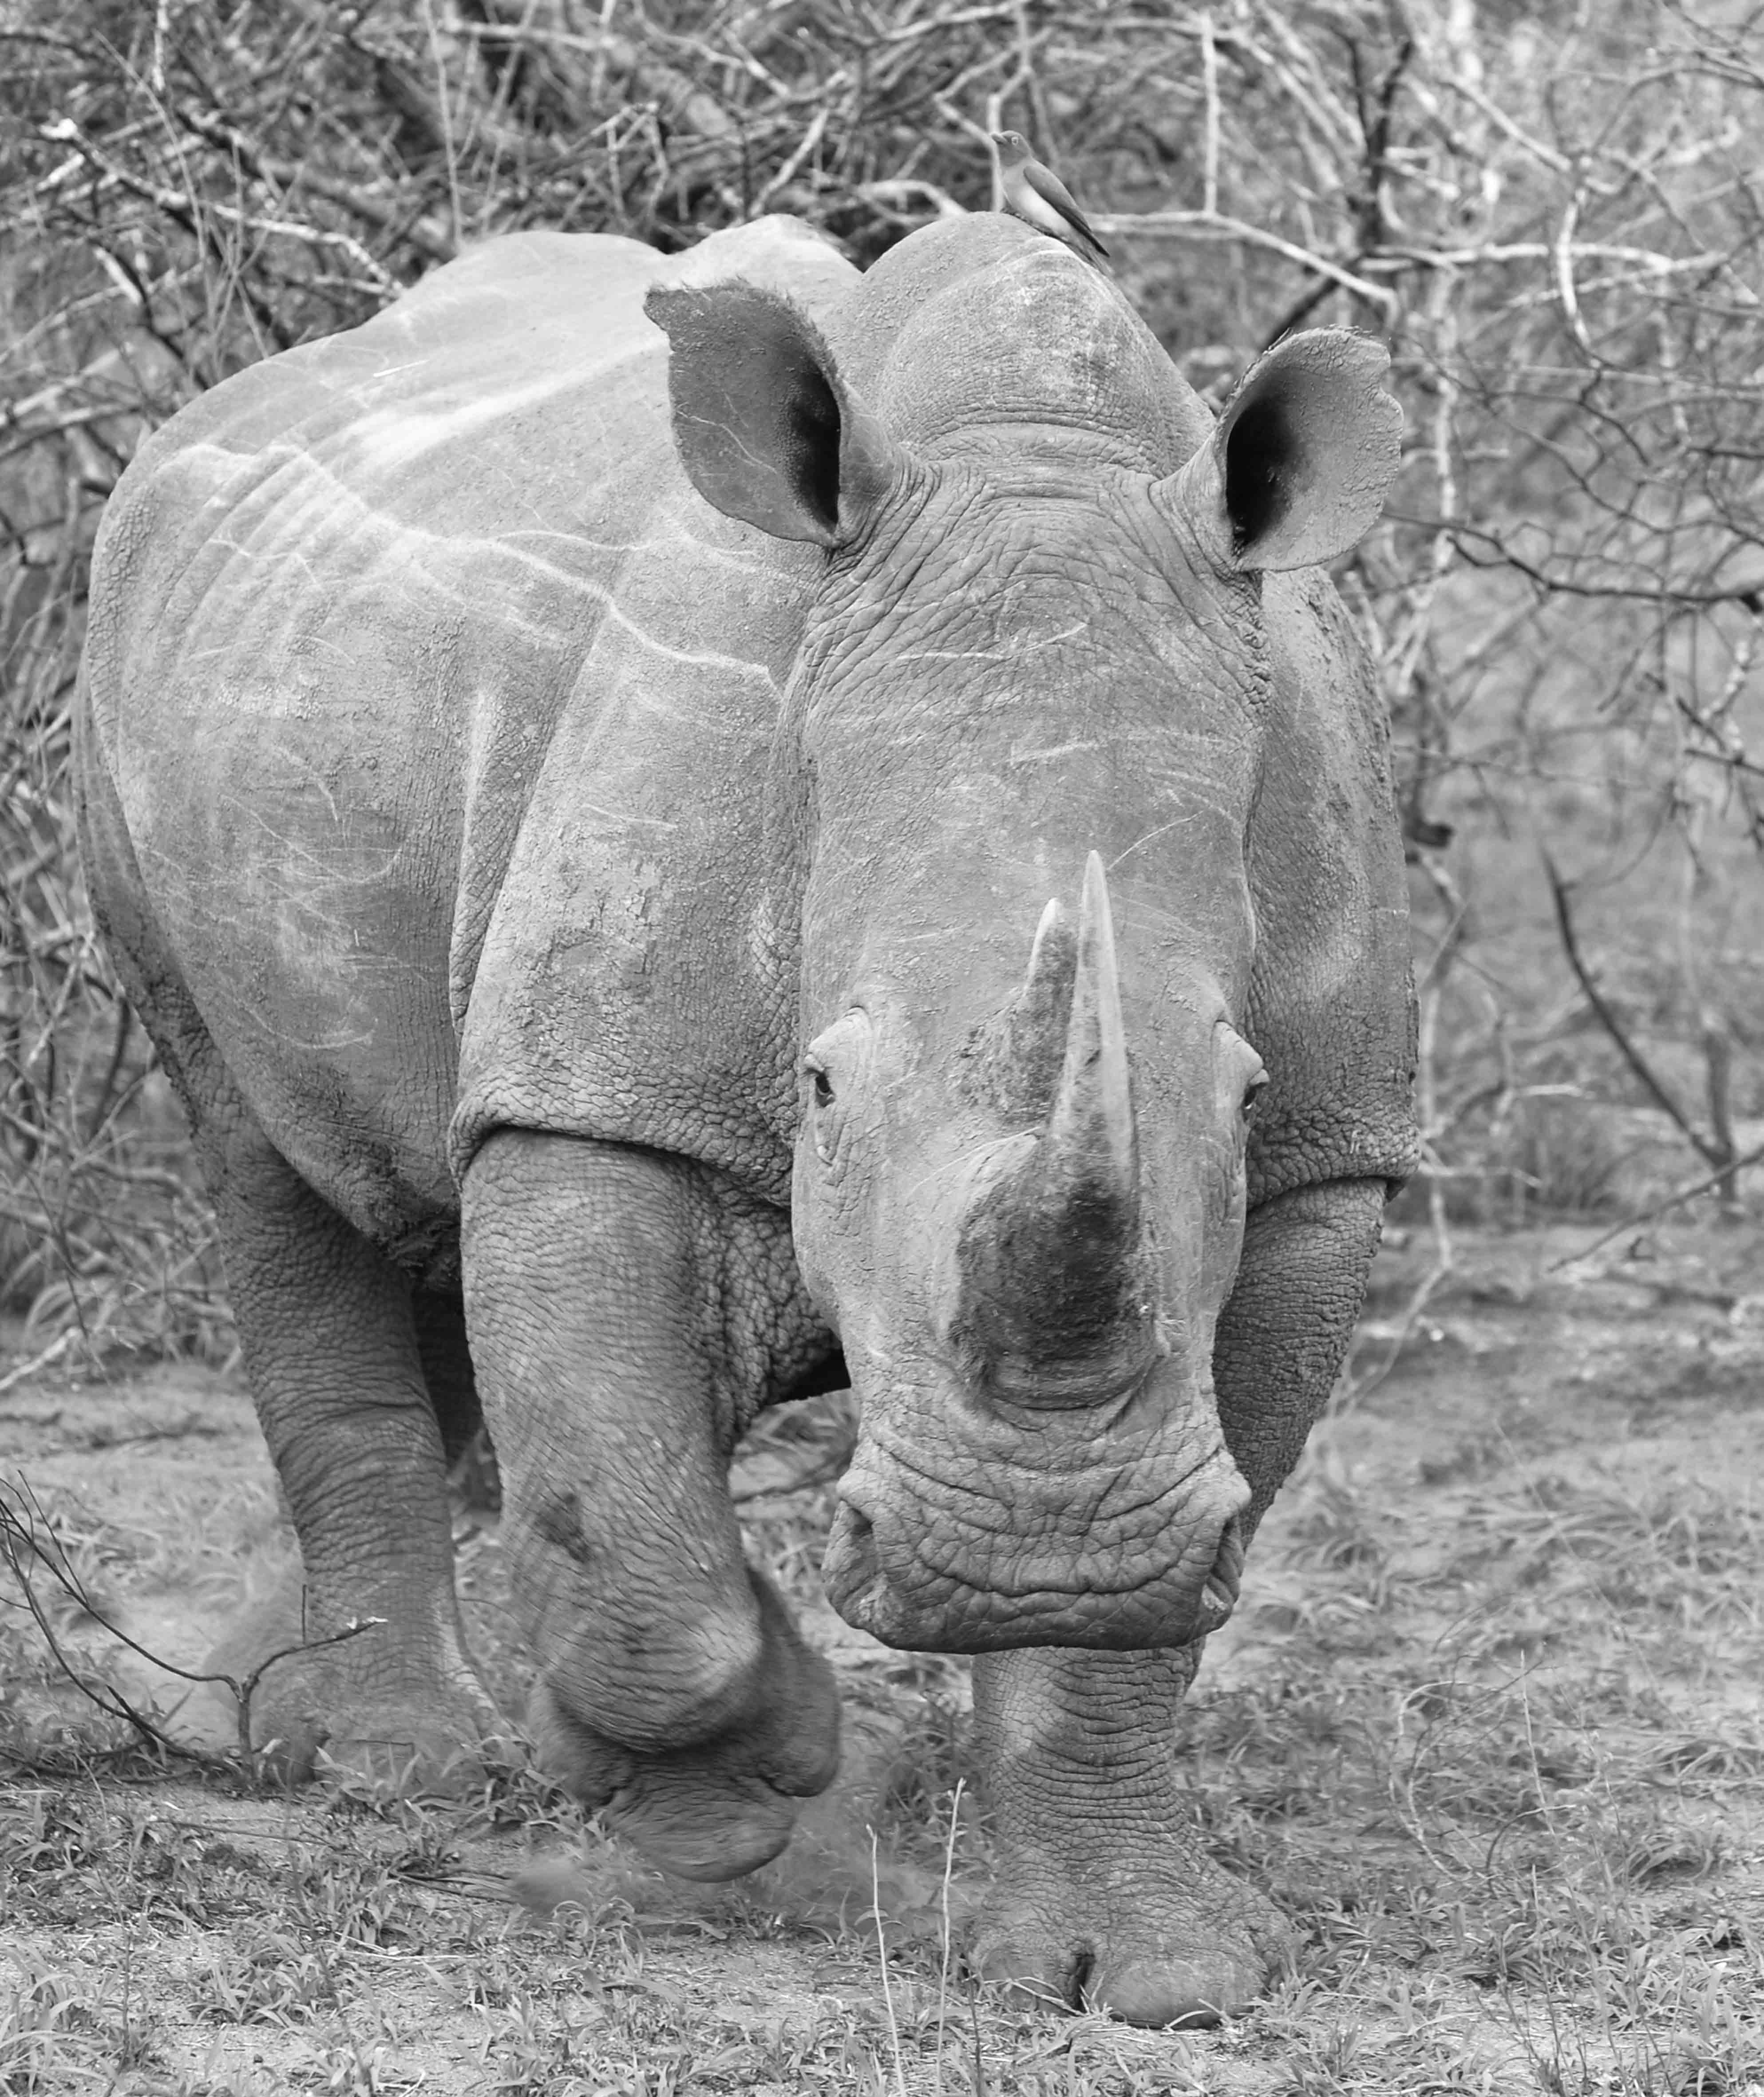 Rhino, ZA ©Johannes Ratermann